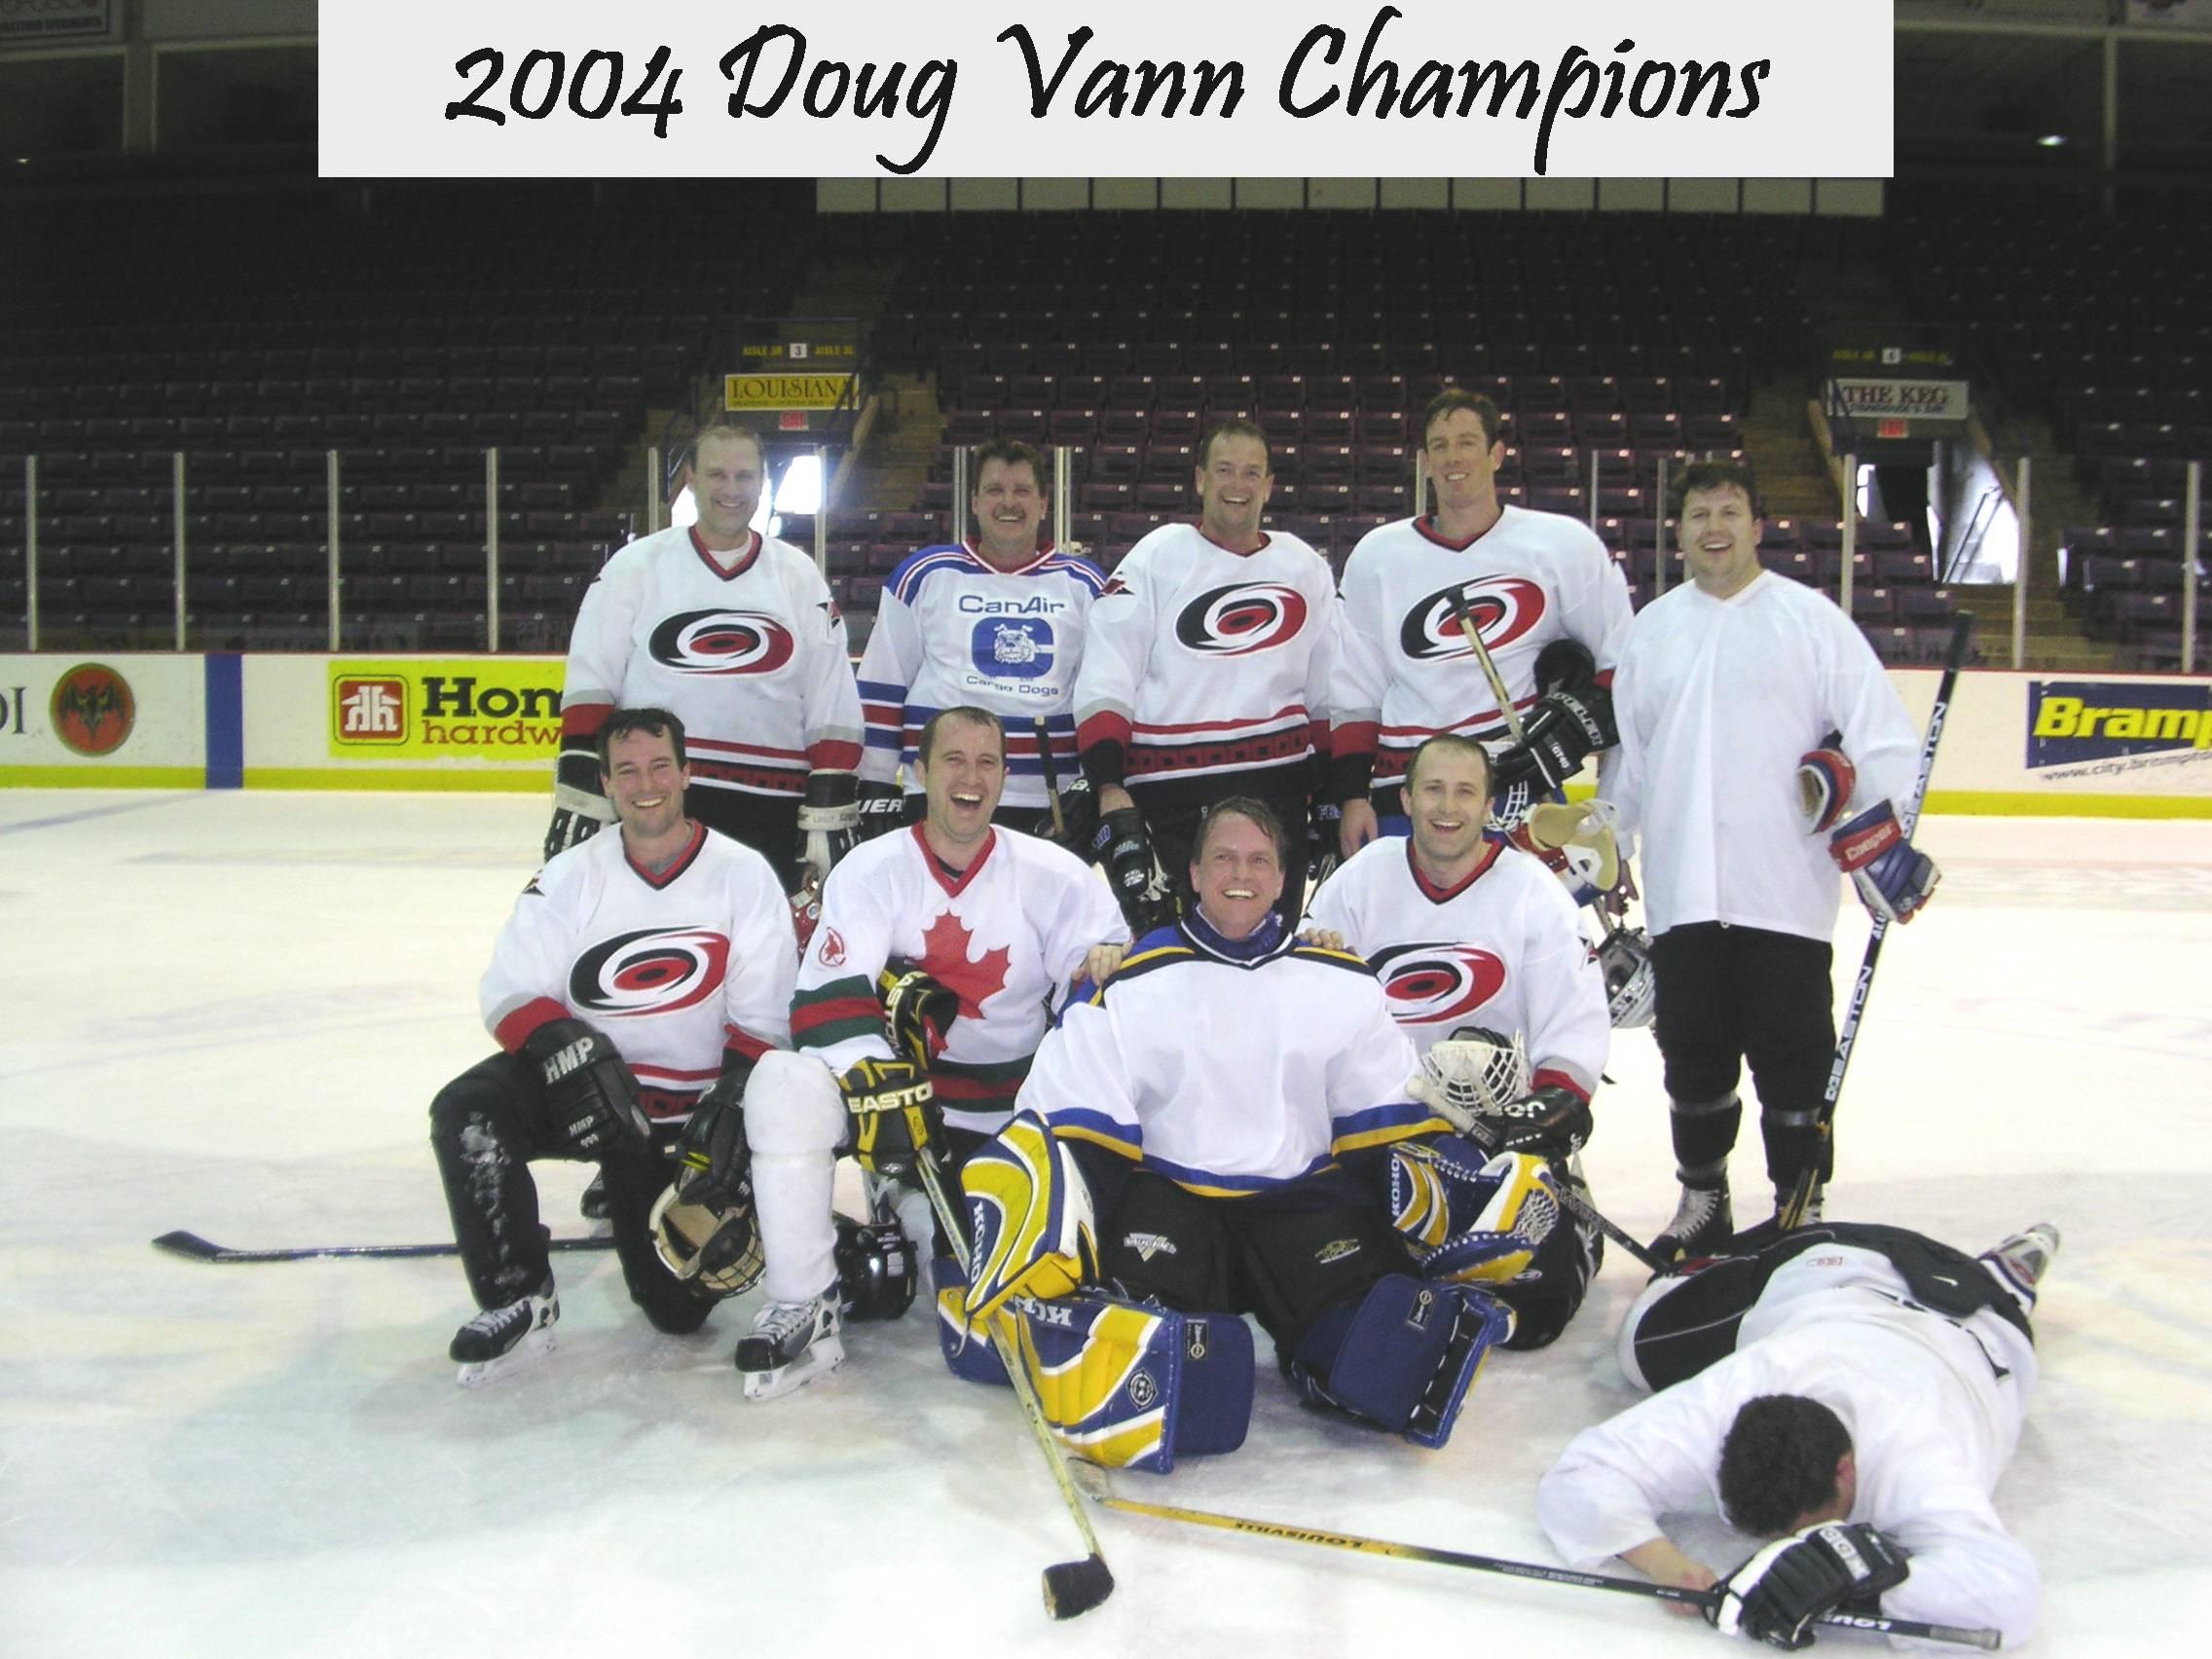 2004 Doug Vann Champions